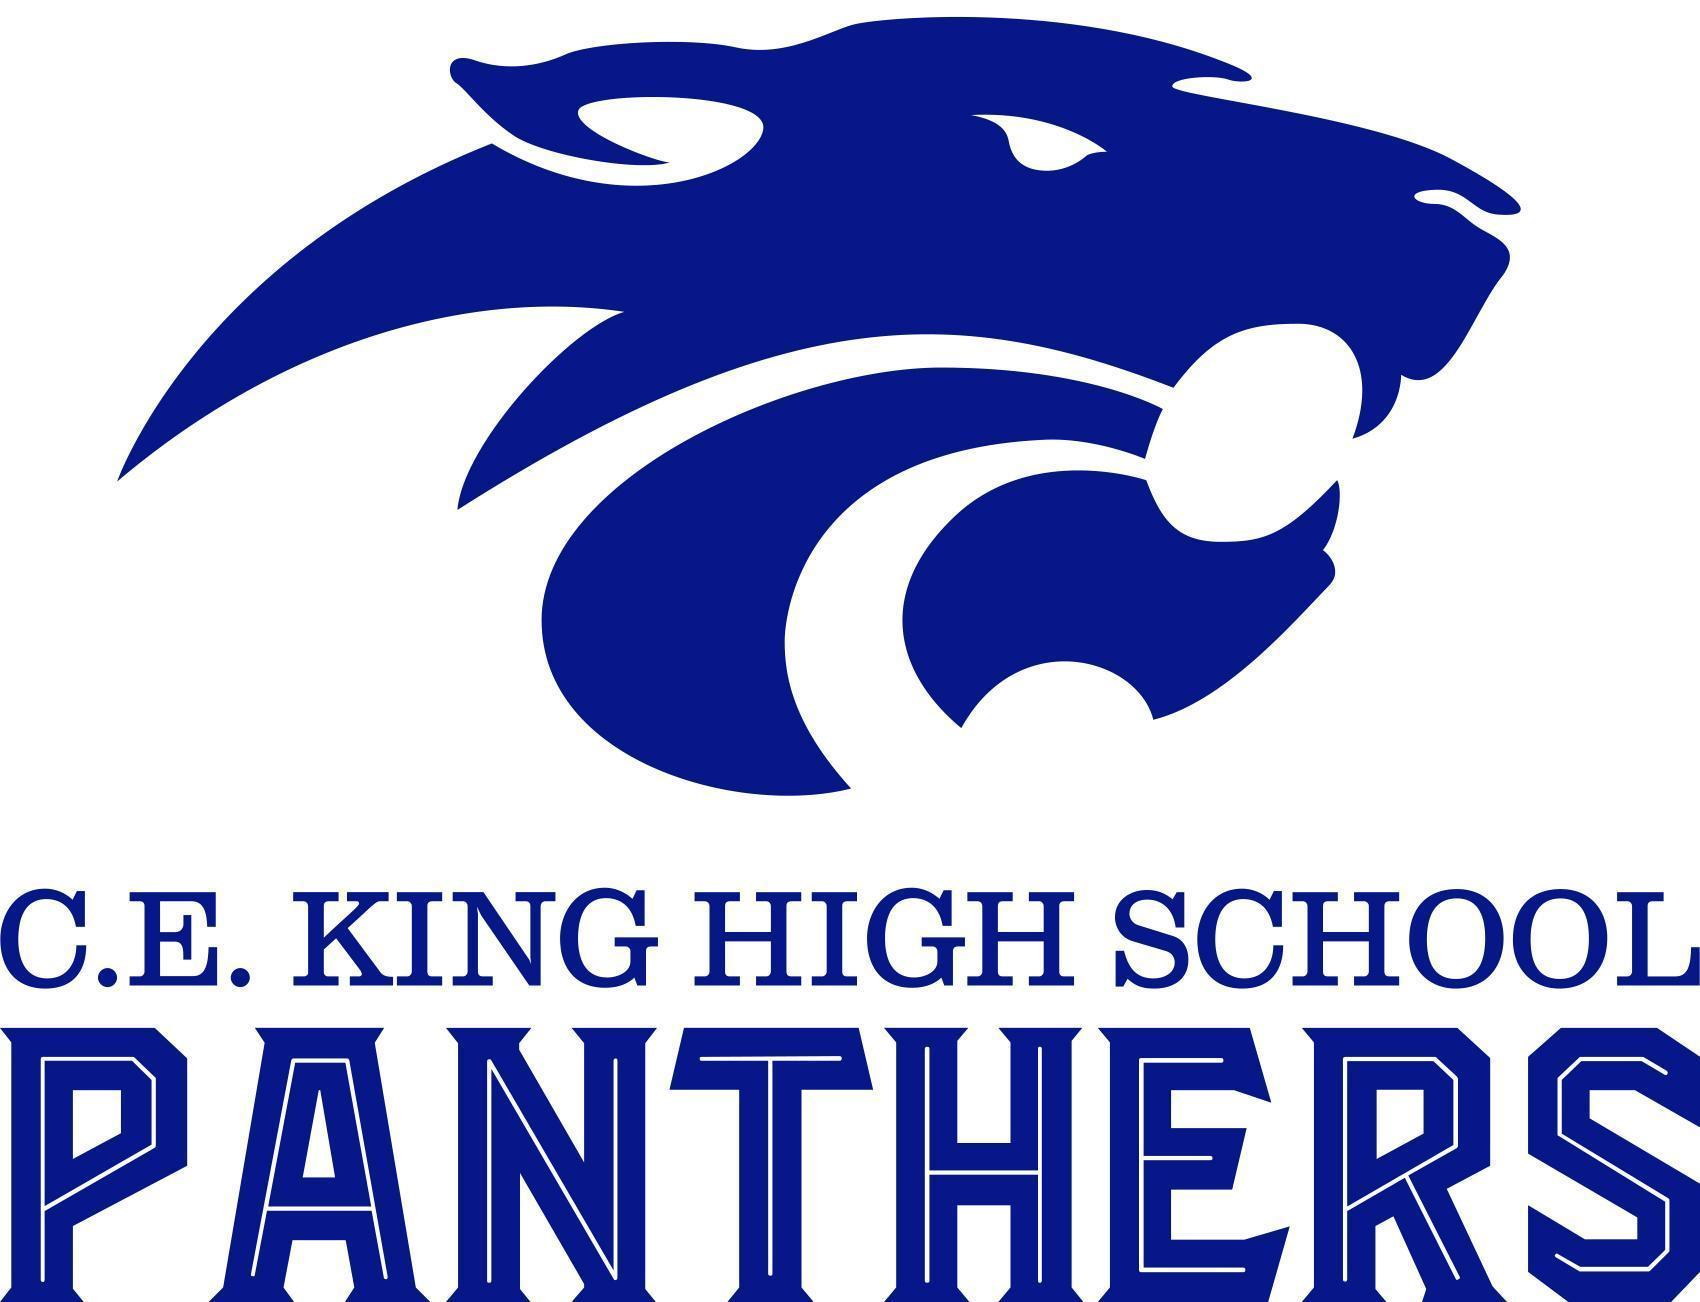 khs_panther_logo_and_wordmark